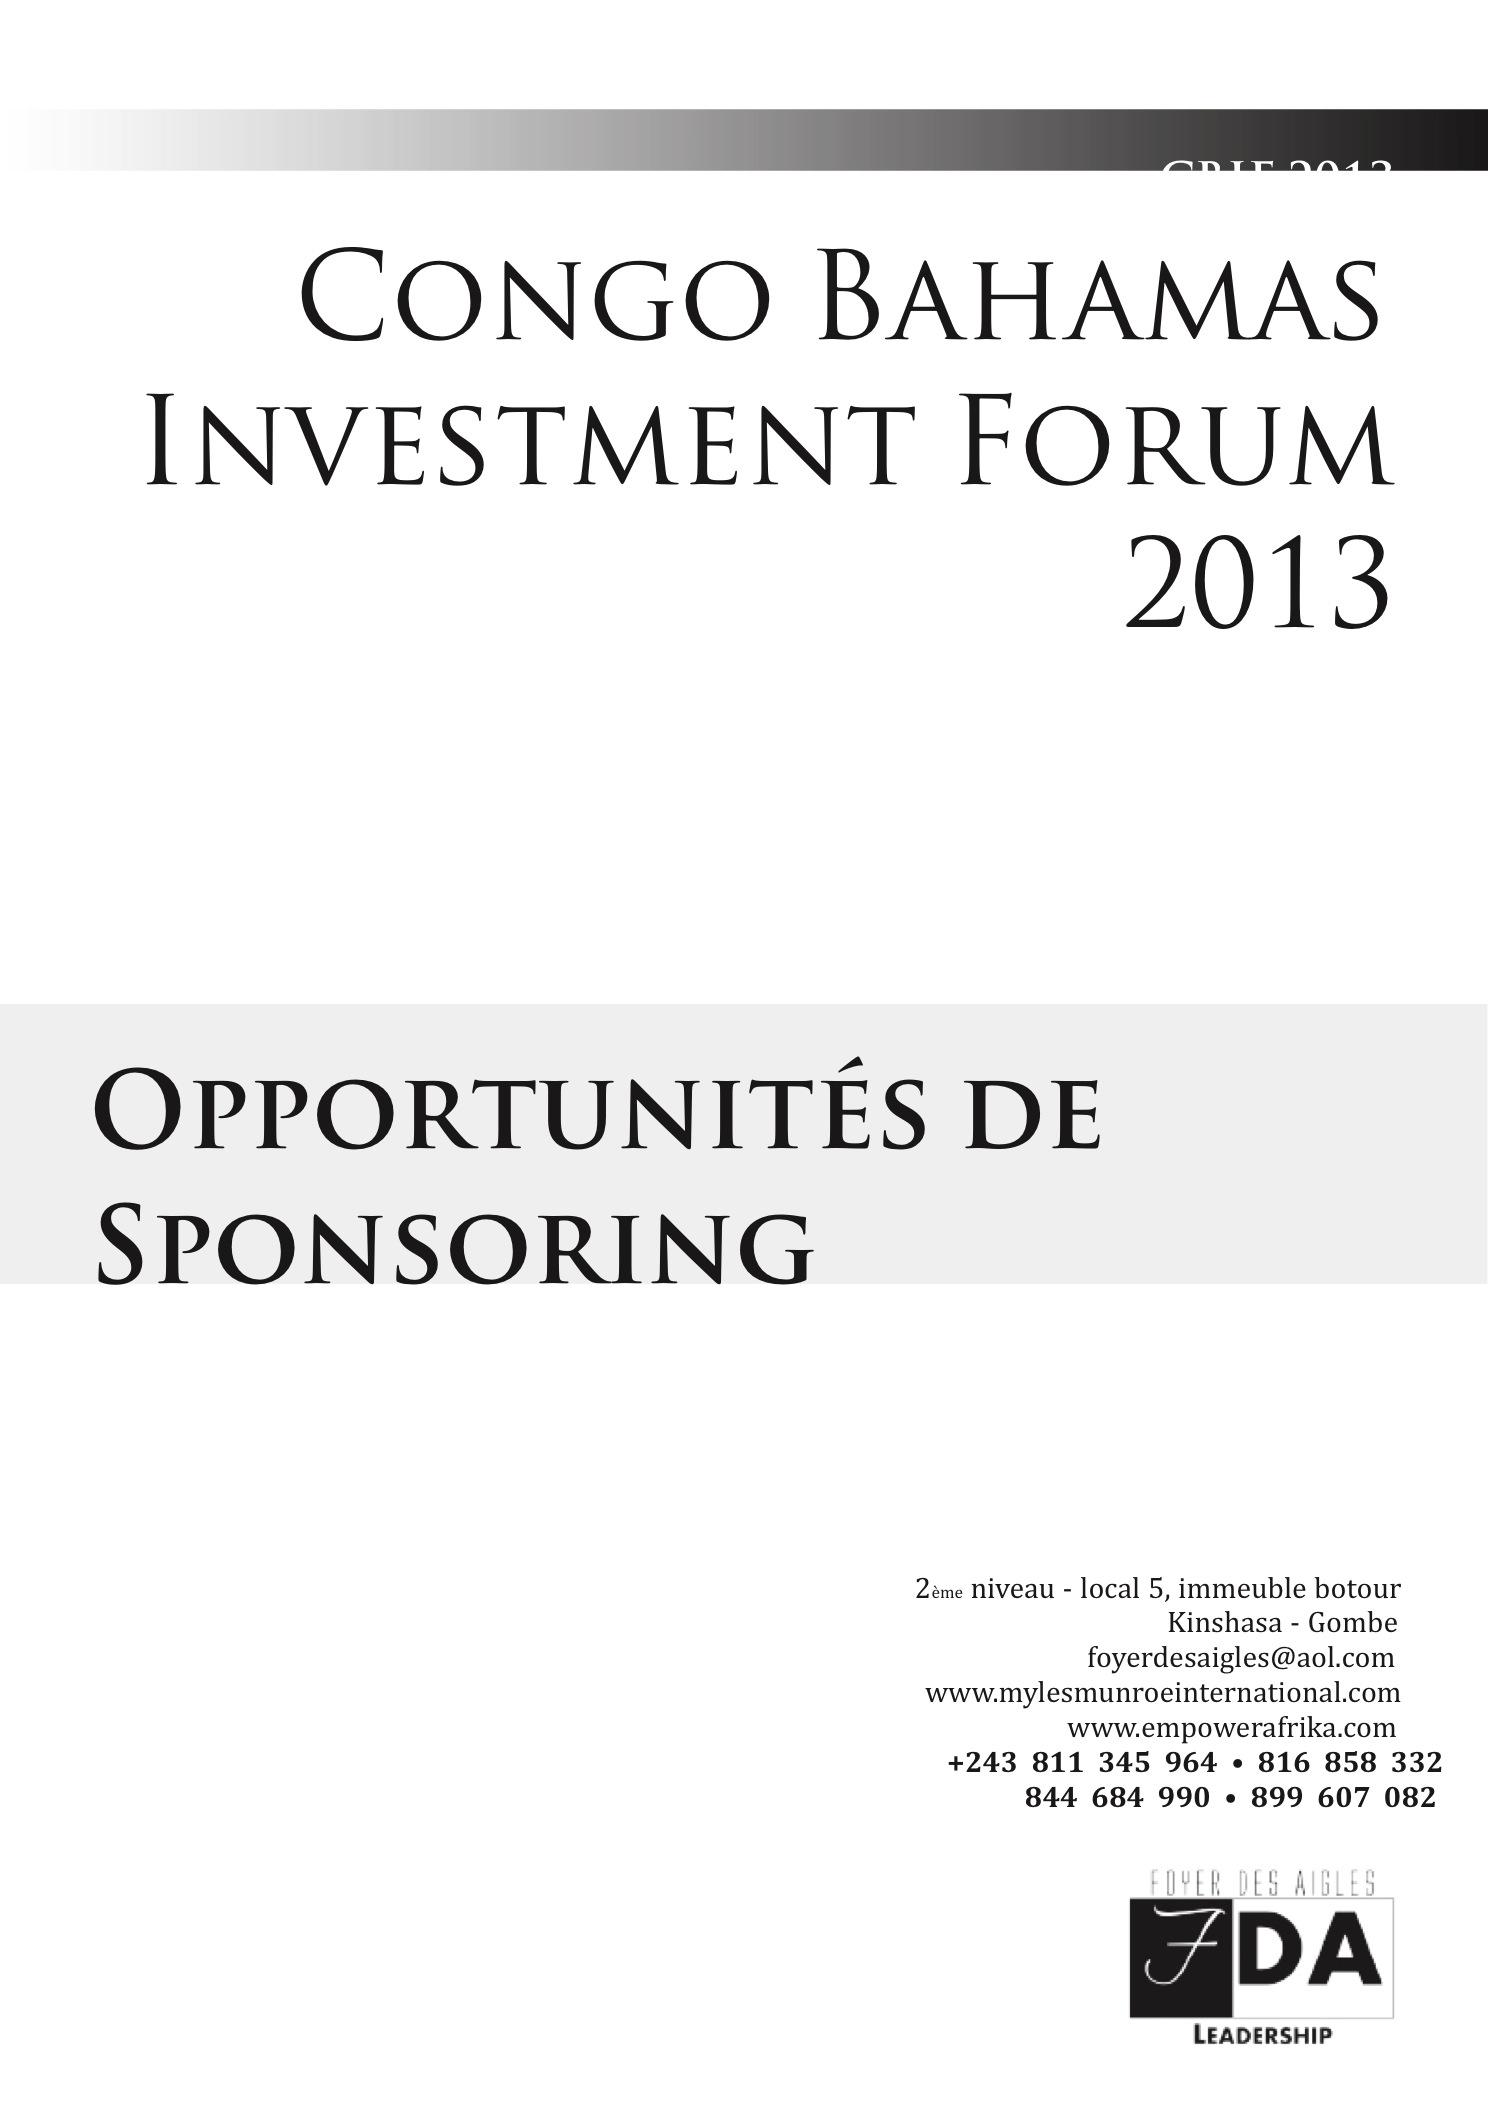 Portail CBIF 2013 & Sponsoring7.jpg